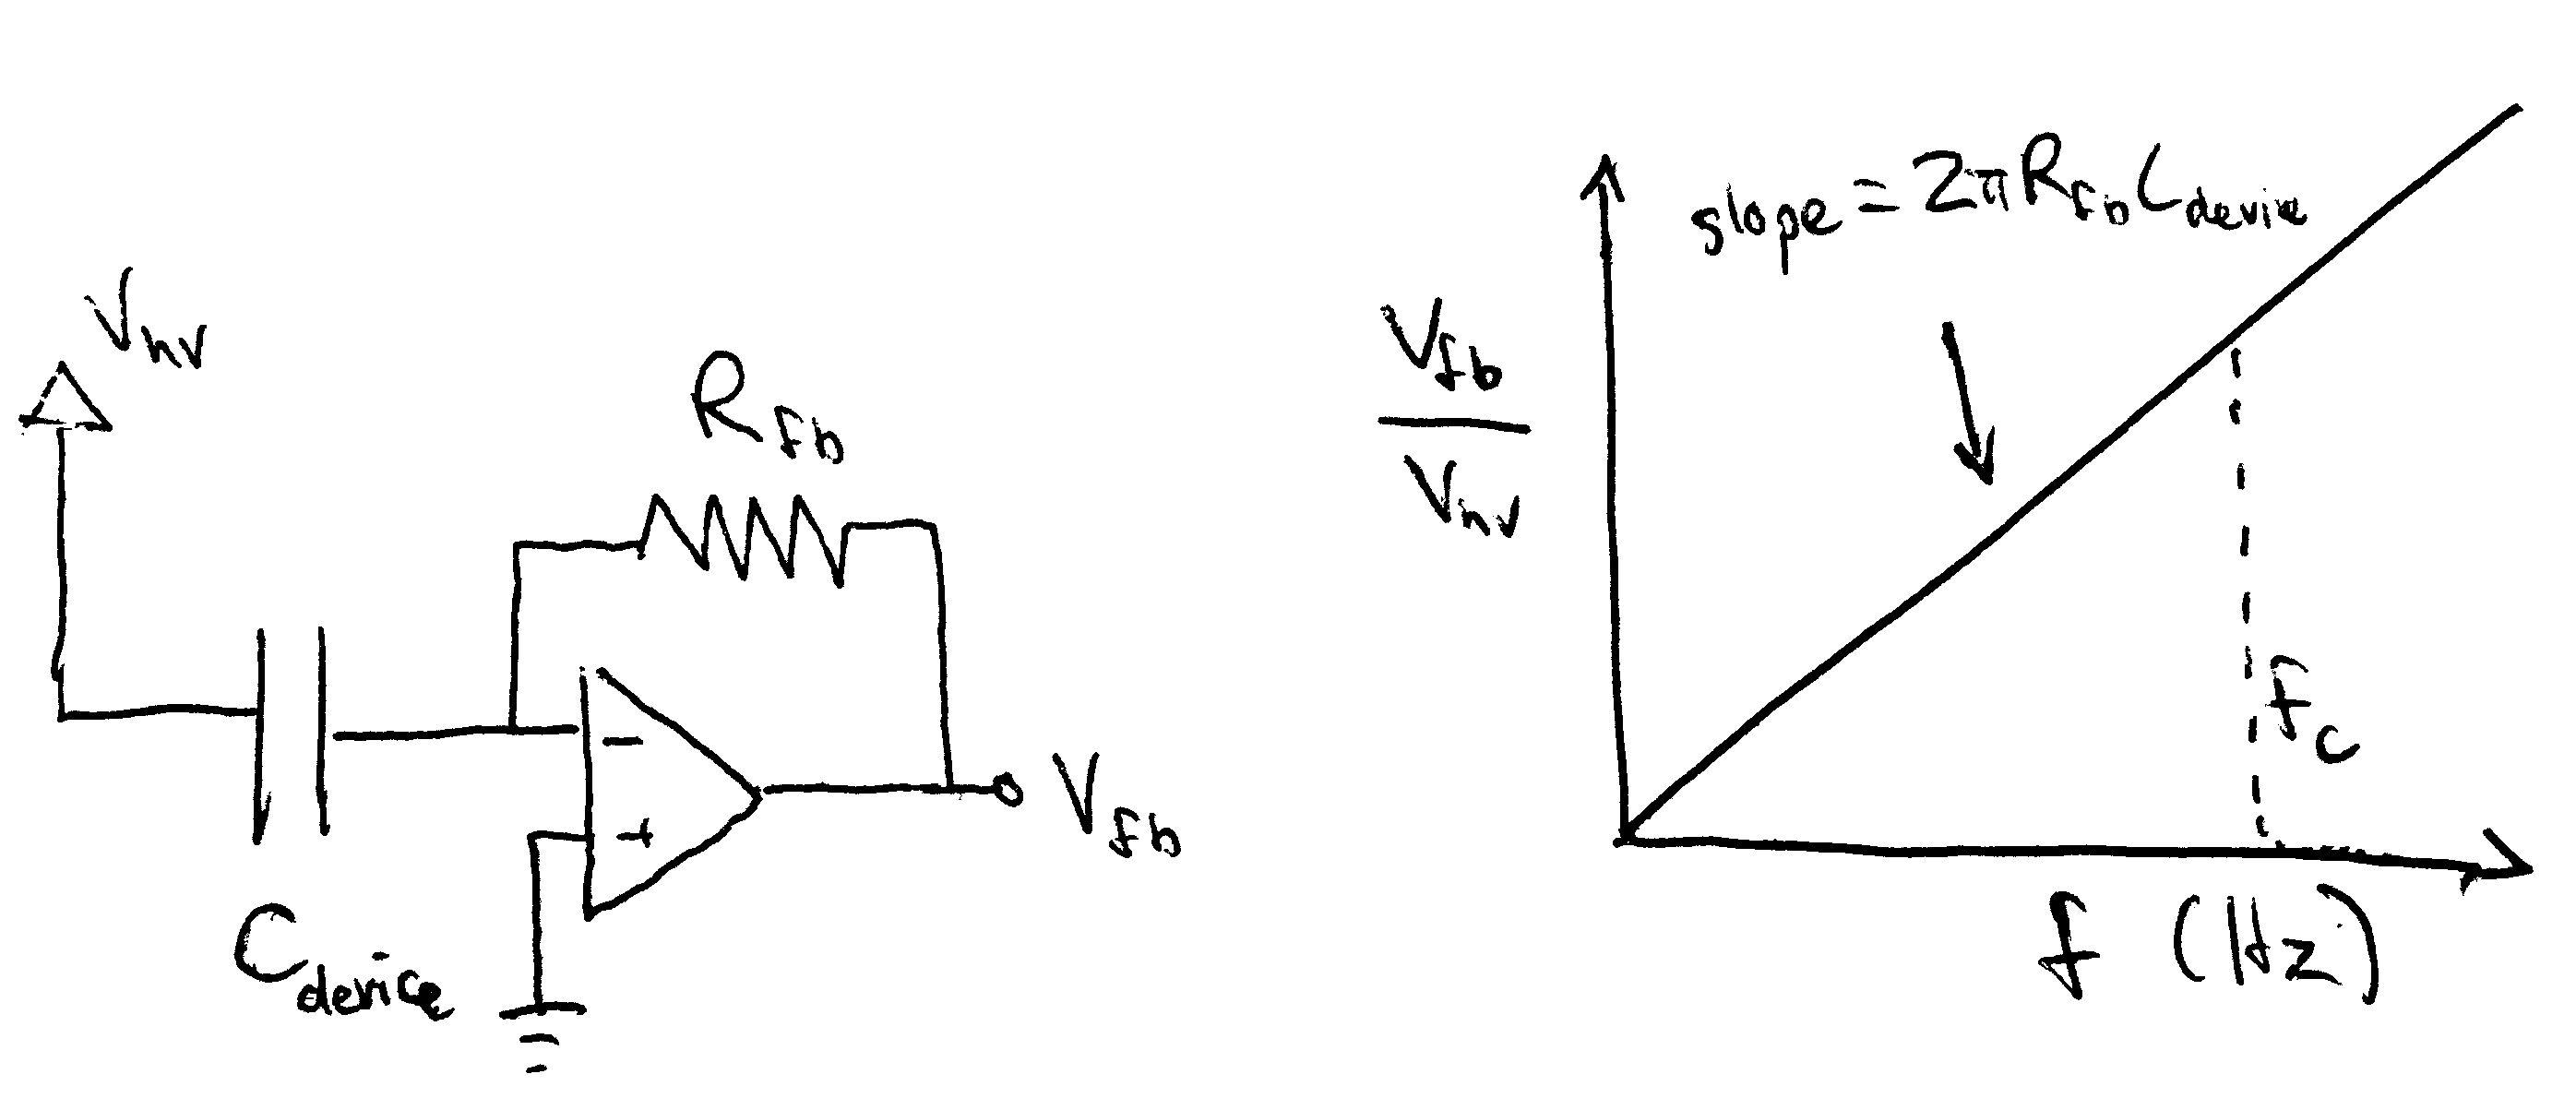 http://microfluidics.utoronto.ca/dropbot/media/anti-aliasing_filter/feedback_signal_transfer_function.jpg